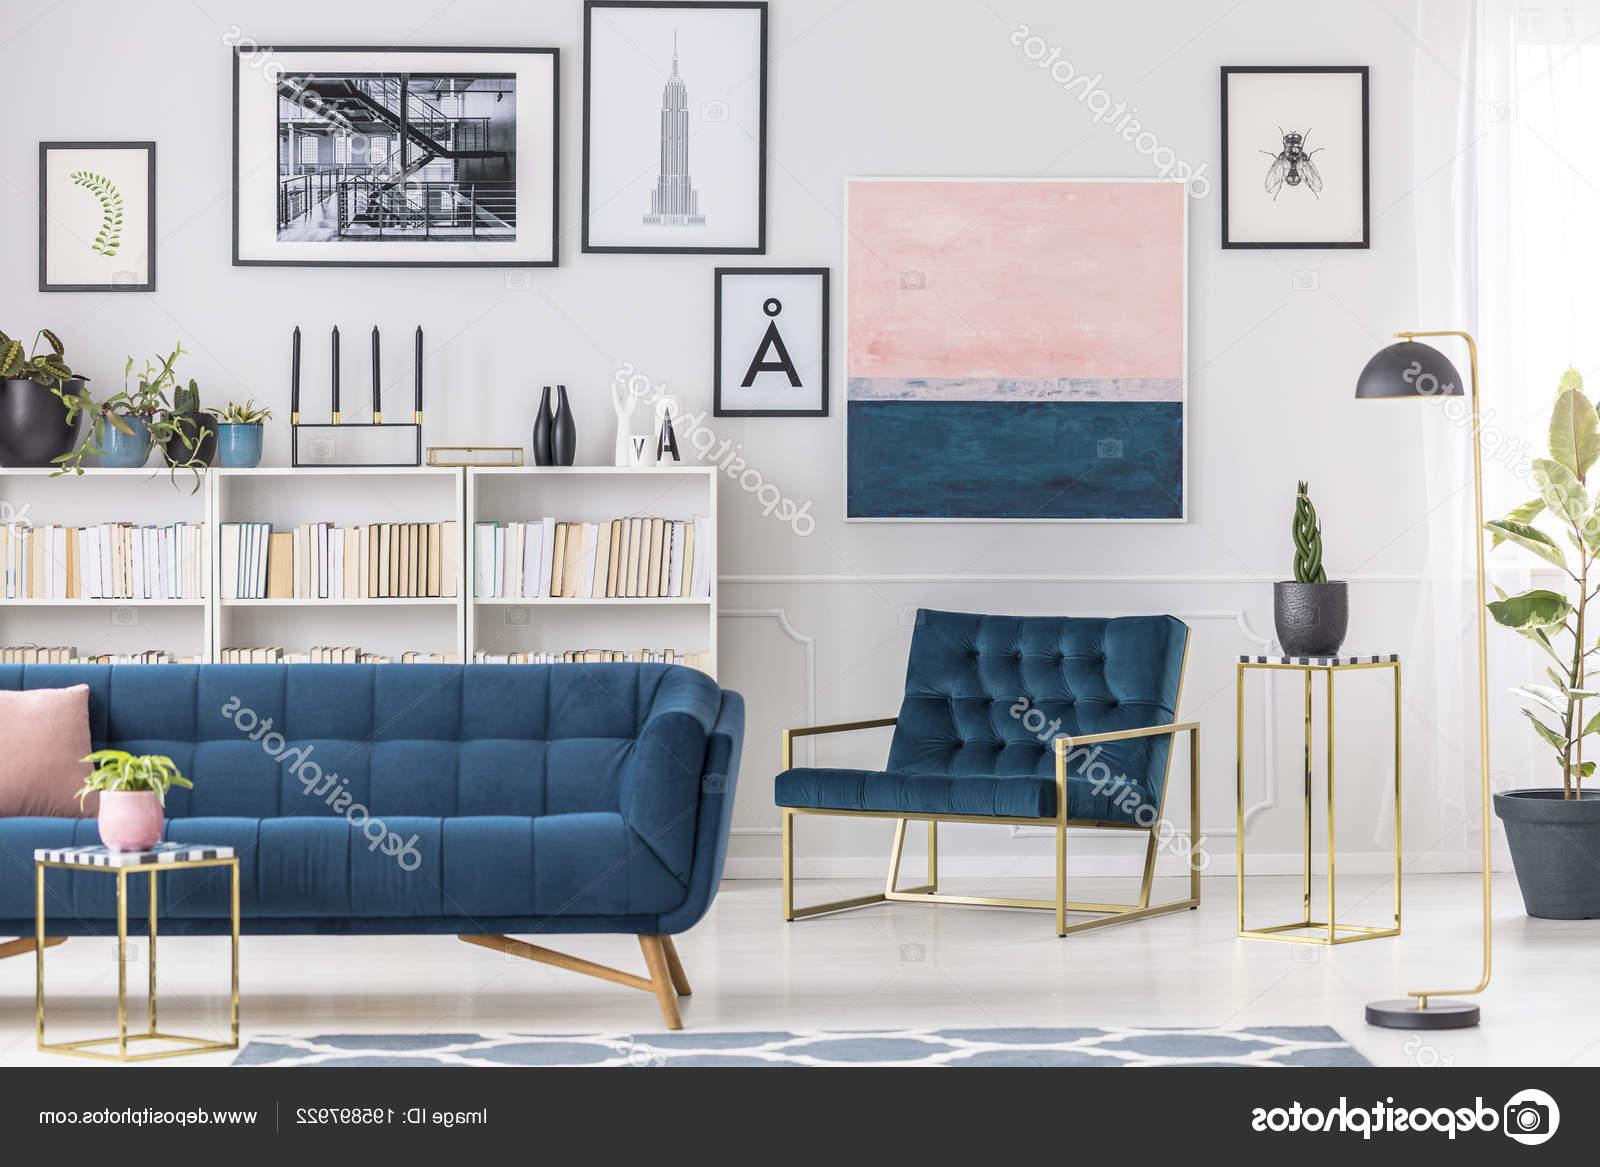 Sofa Azul Marino Thdr sofà Azul Marino Blanco Estante Pared Con Pintura Rosa Interior